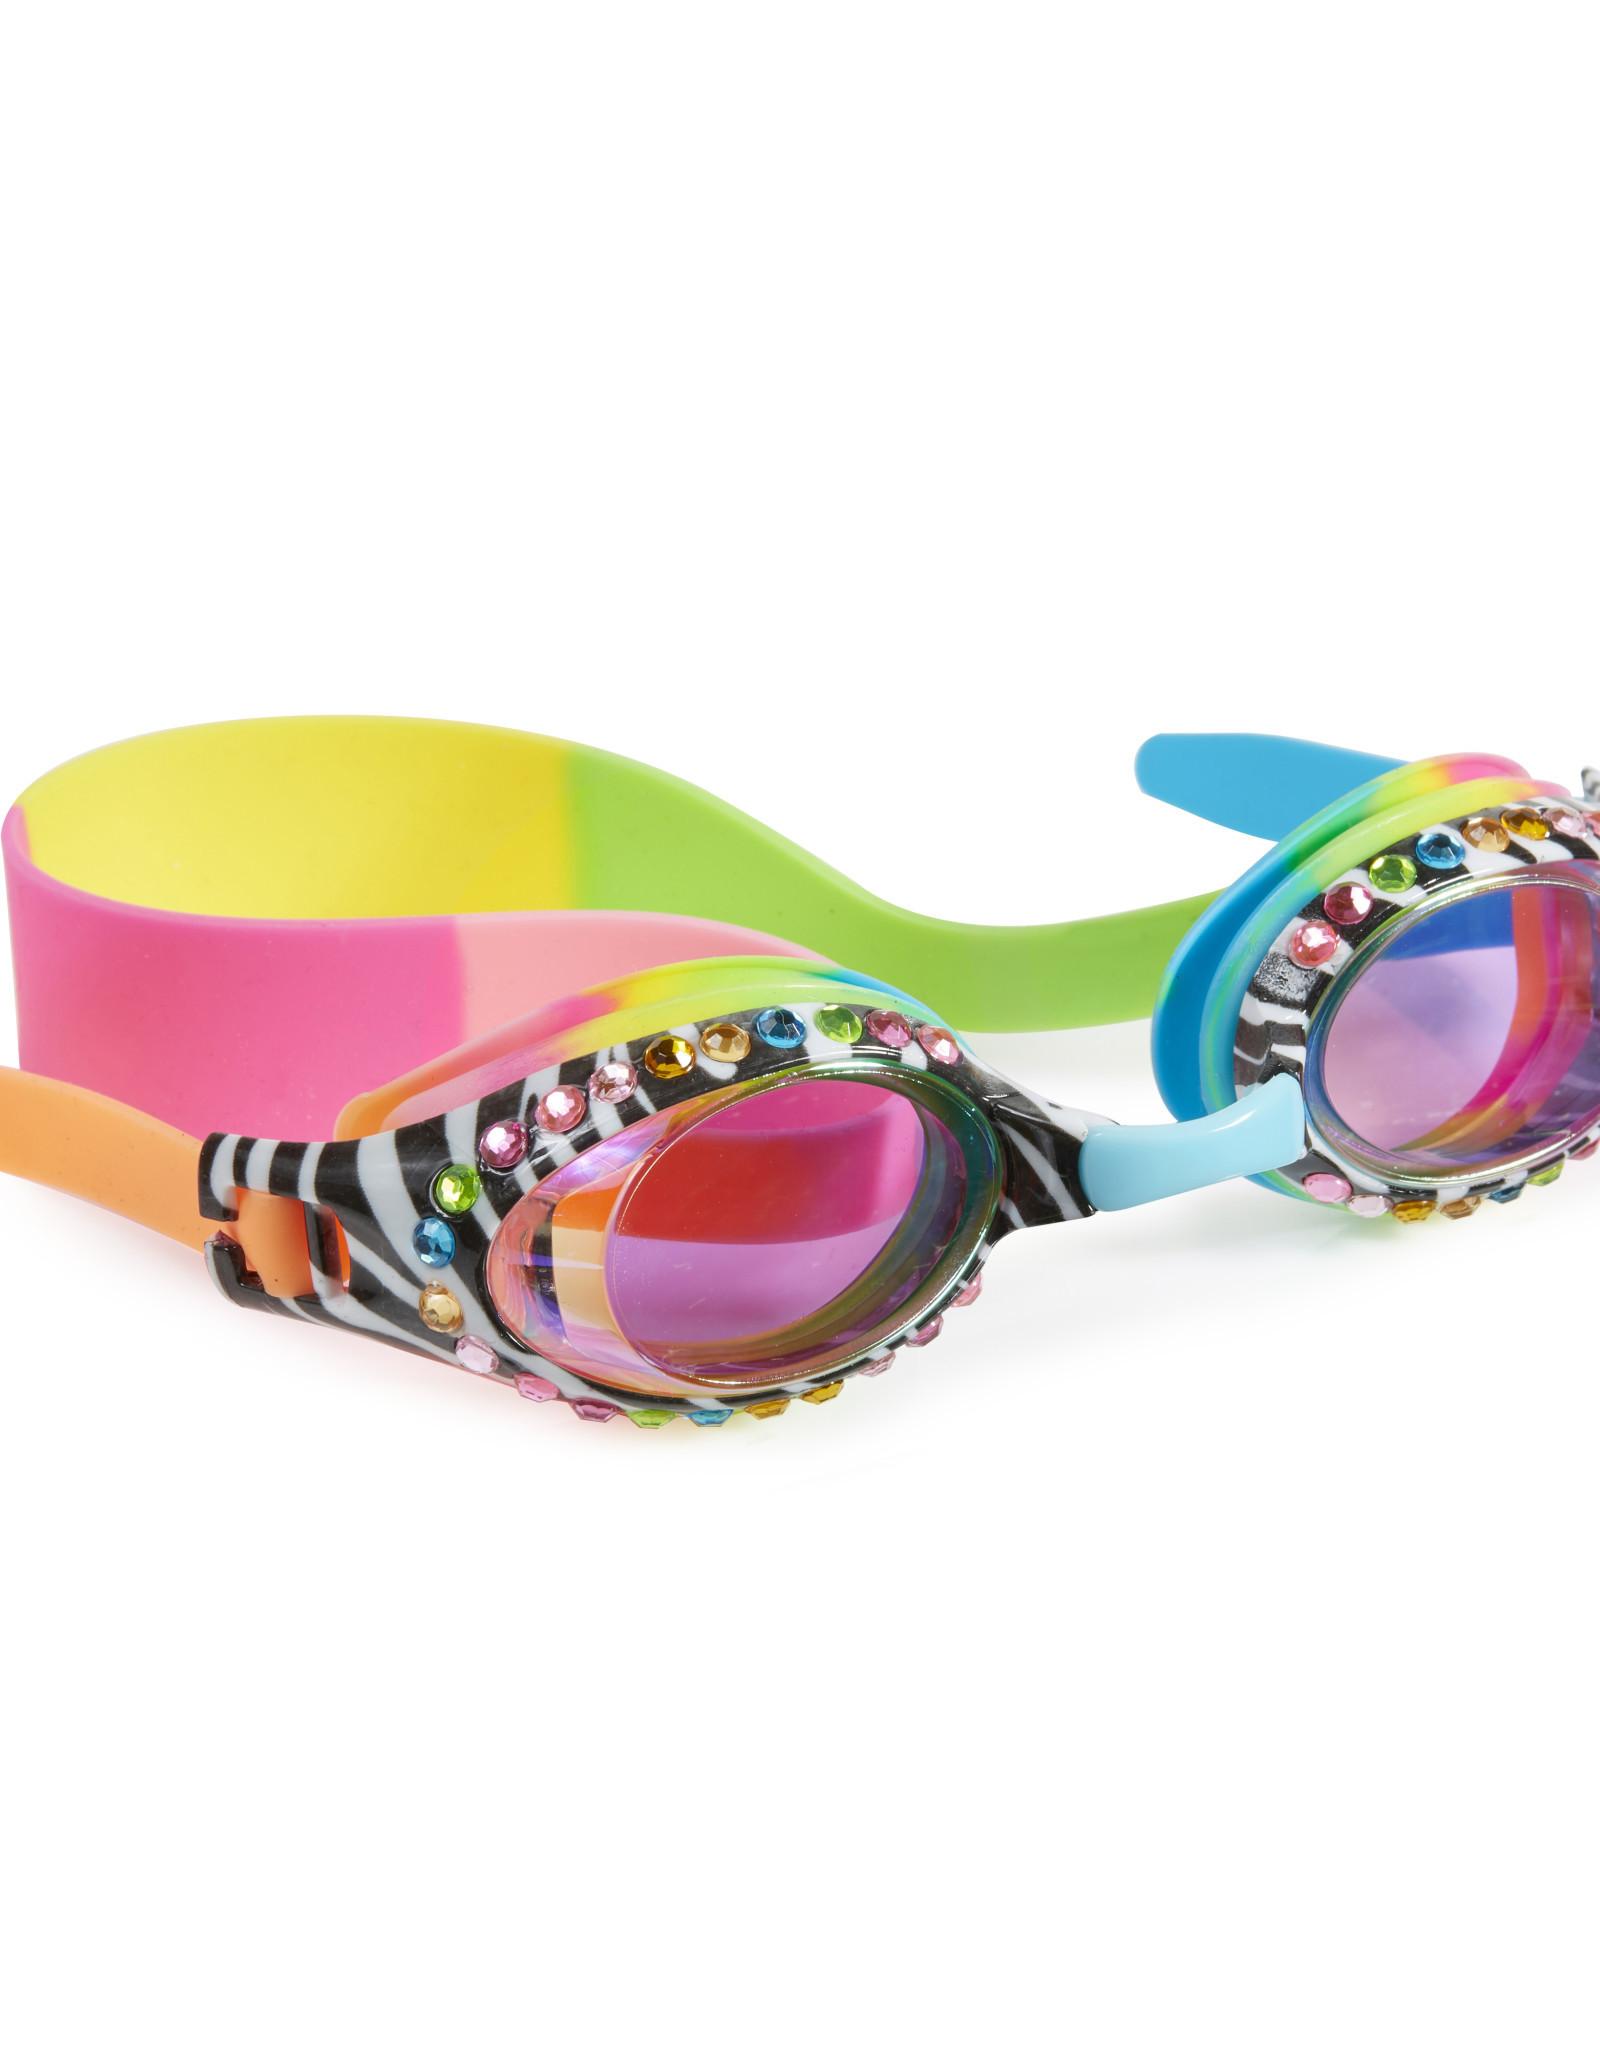 Bling2o Bling2o Goggles - Zebra Rainbow